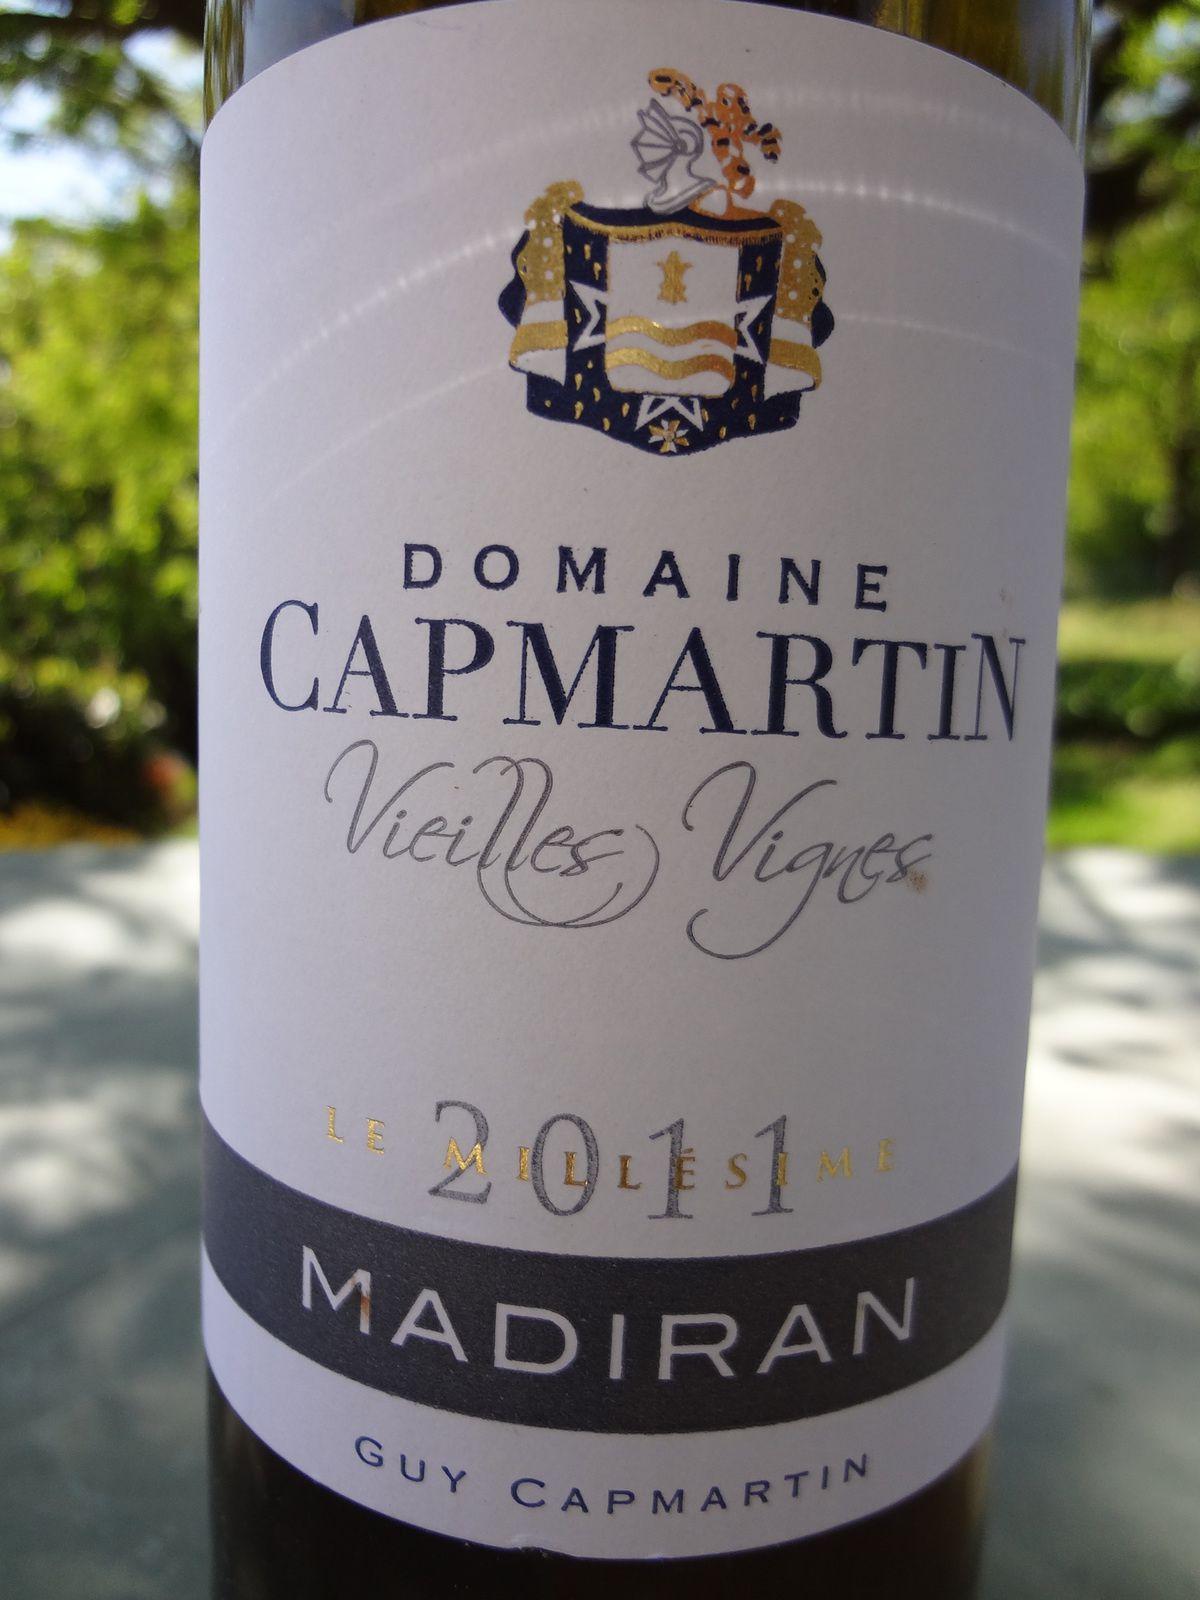 VINO PASSION Madiran 2011Domaine Capmartin.